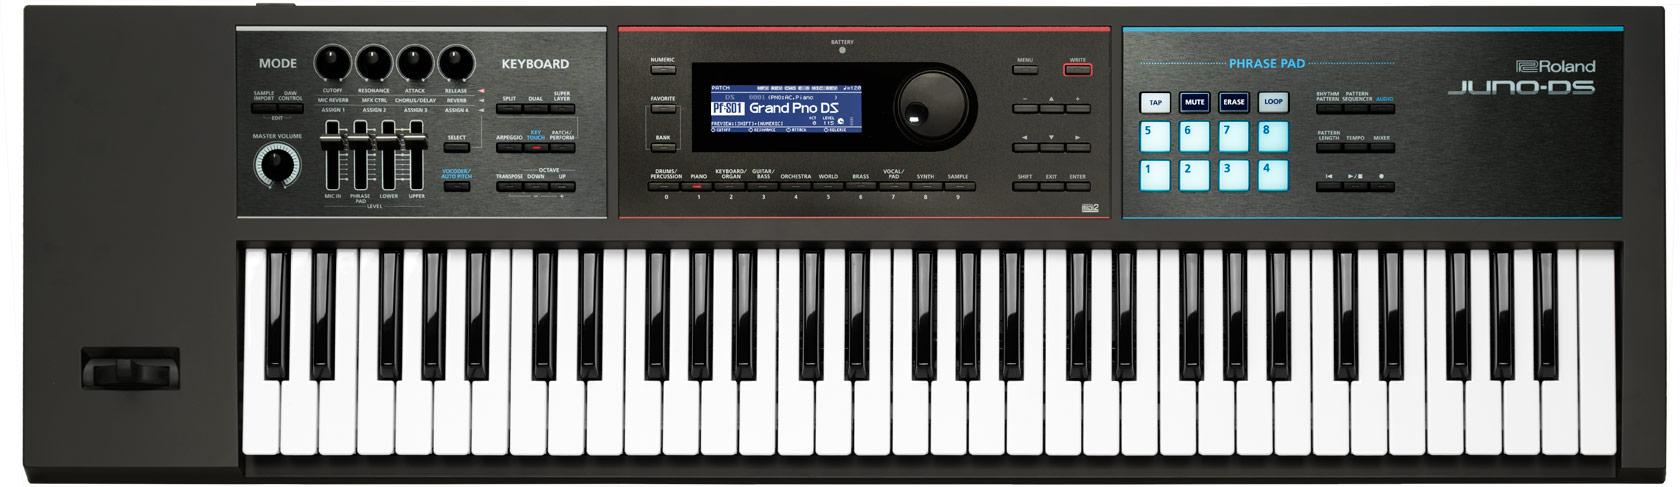 61-Key Synthesizer/Arranger